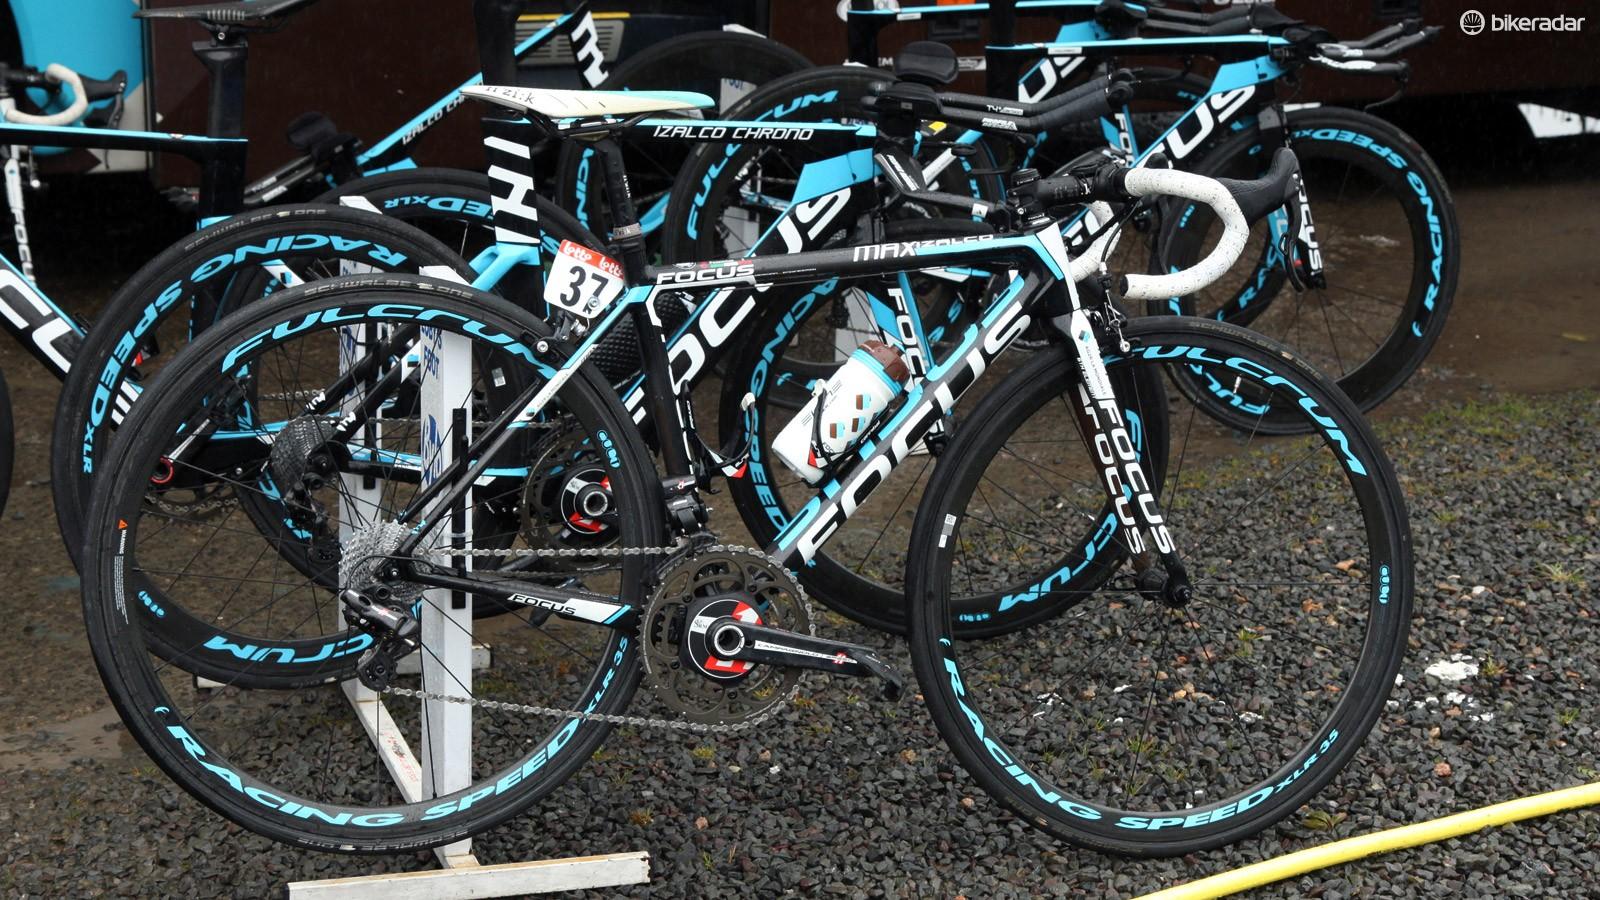 Domenico Pozzovivo's (Ag2r-La Mondiale) Focus Izalco Max will supposedly weigh exactly 6.8kg when the Giro d'Italia hits the high mountains